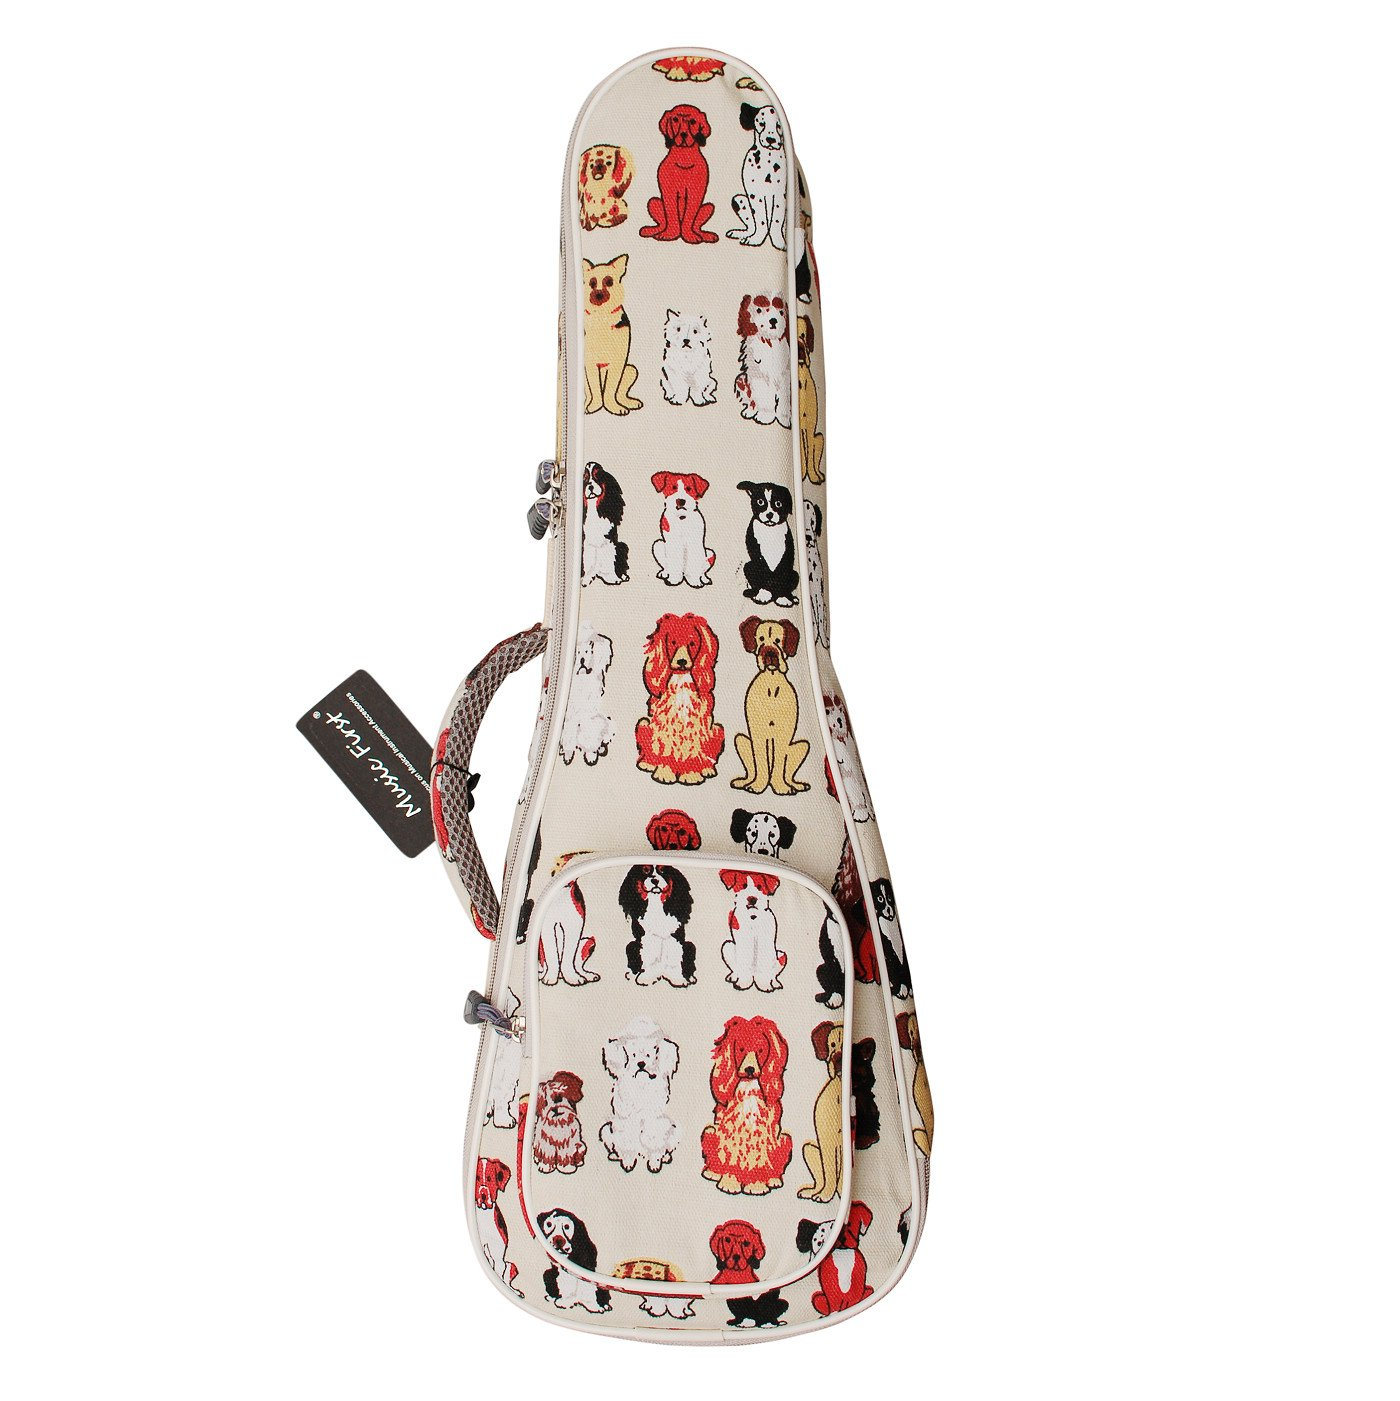 MUSIC FIRST cotton 23/24 inch Concert''MR DOG'' ukulele case ukulele bag ukulele cover, Original Design. Best Christmas Gift!